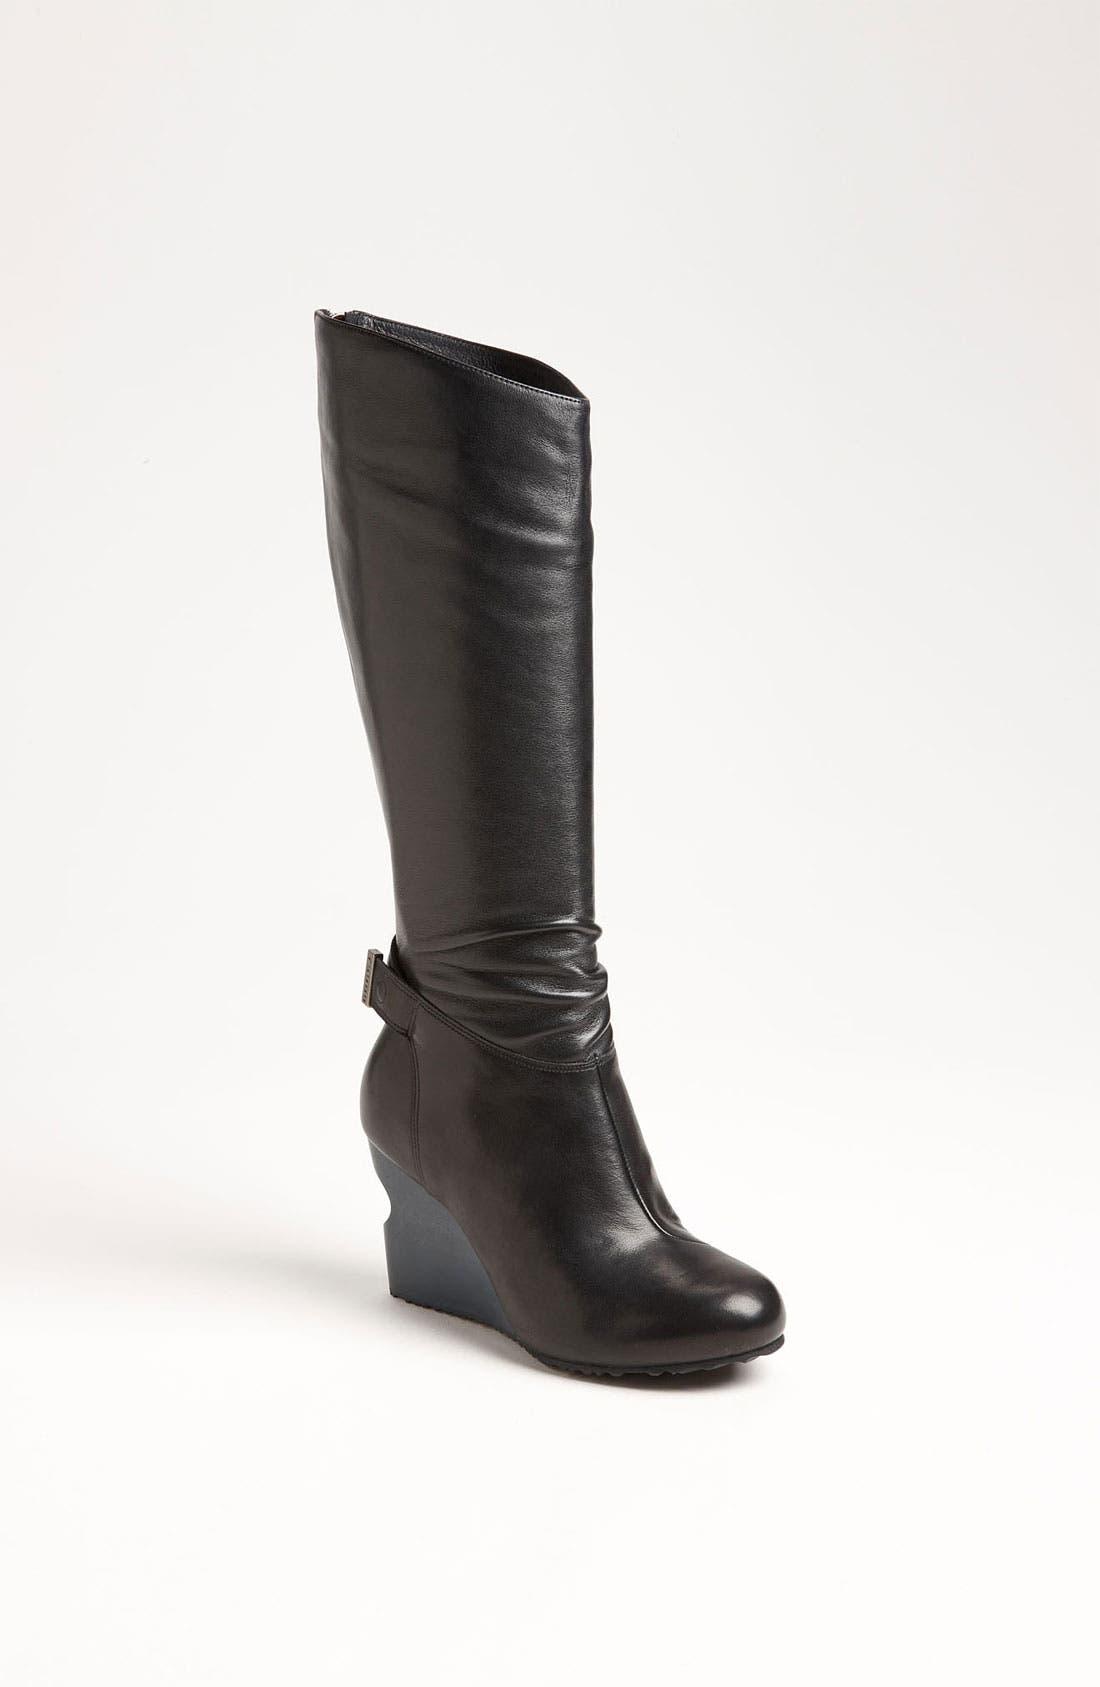 Alternate Image 1 Selected - Tsubo 'Hollis' Boot